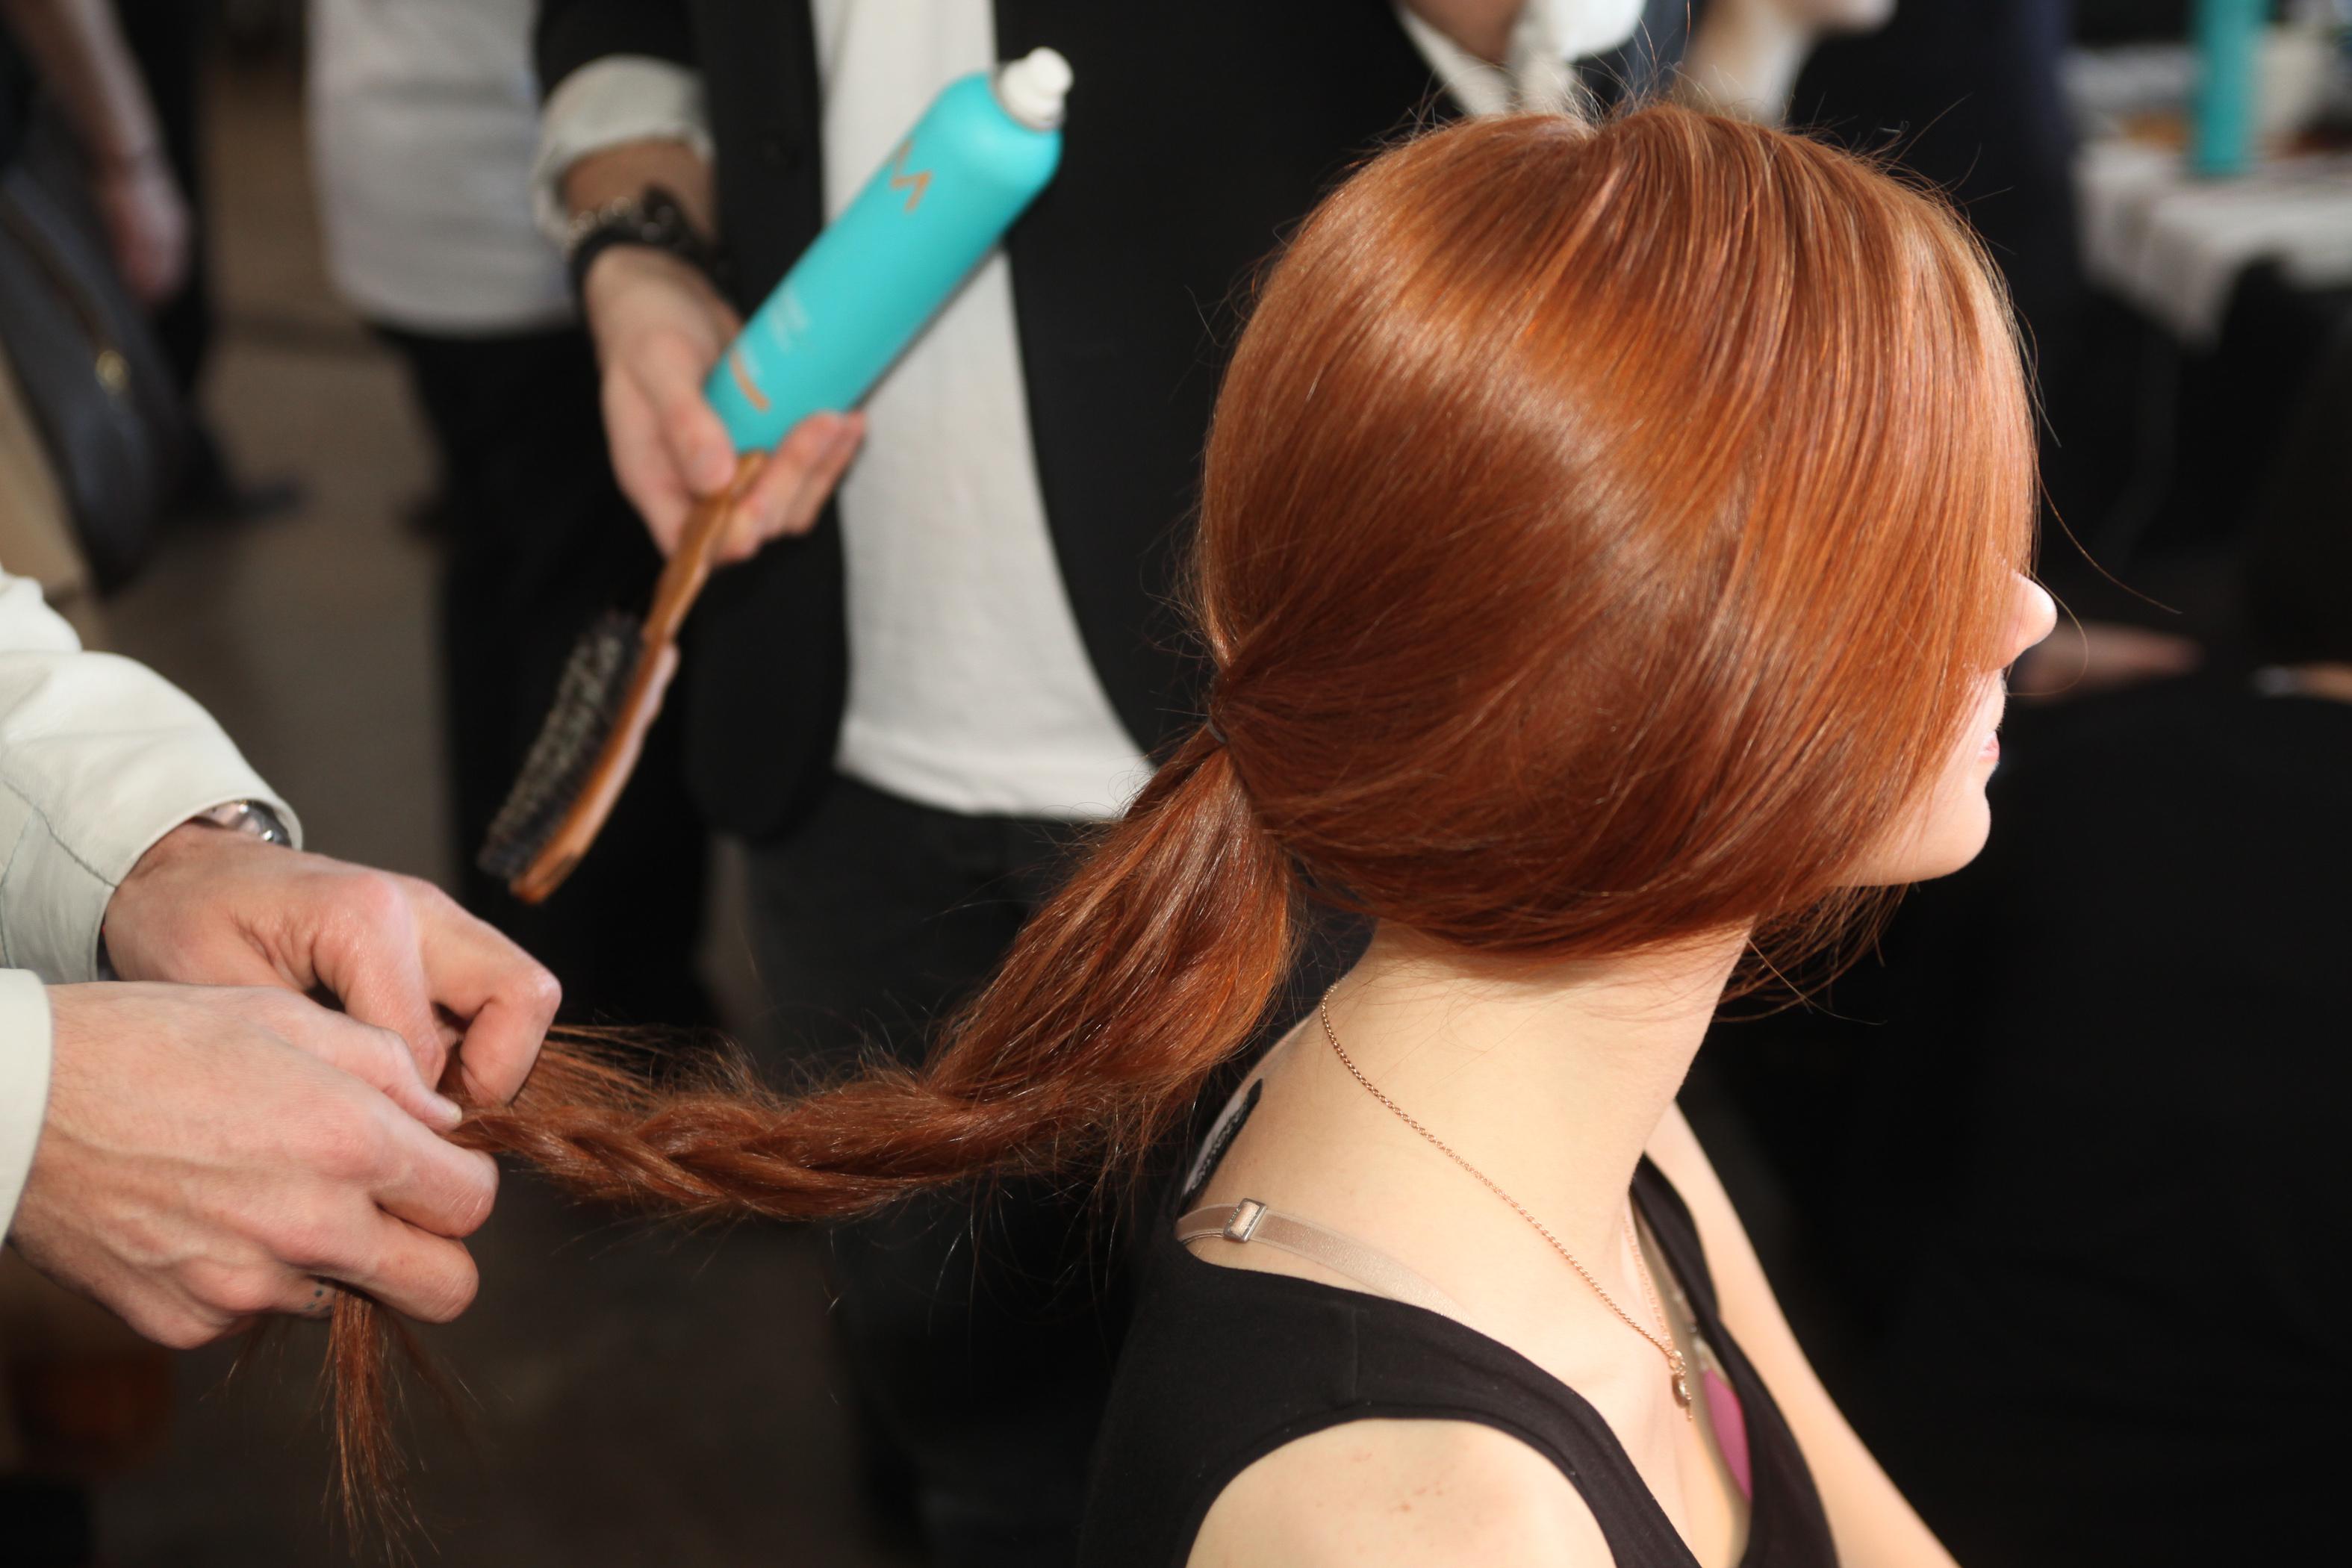 Fall/Winter 2013 Hair Looks By Moroccanoil Artistic Director Antonio Corral Calero